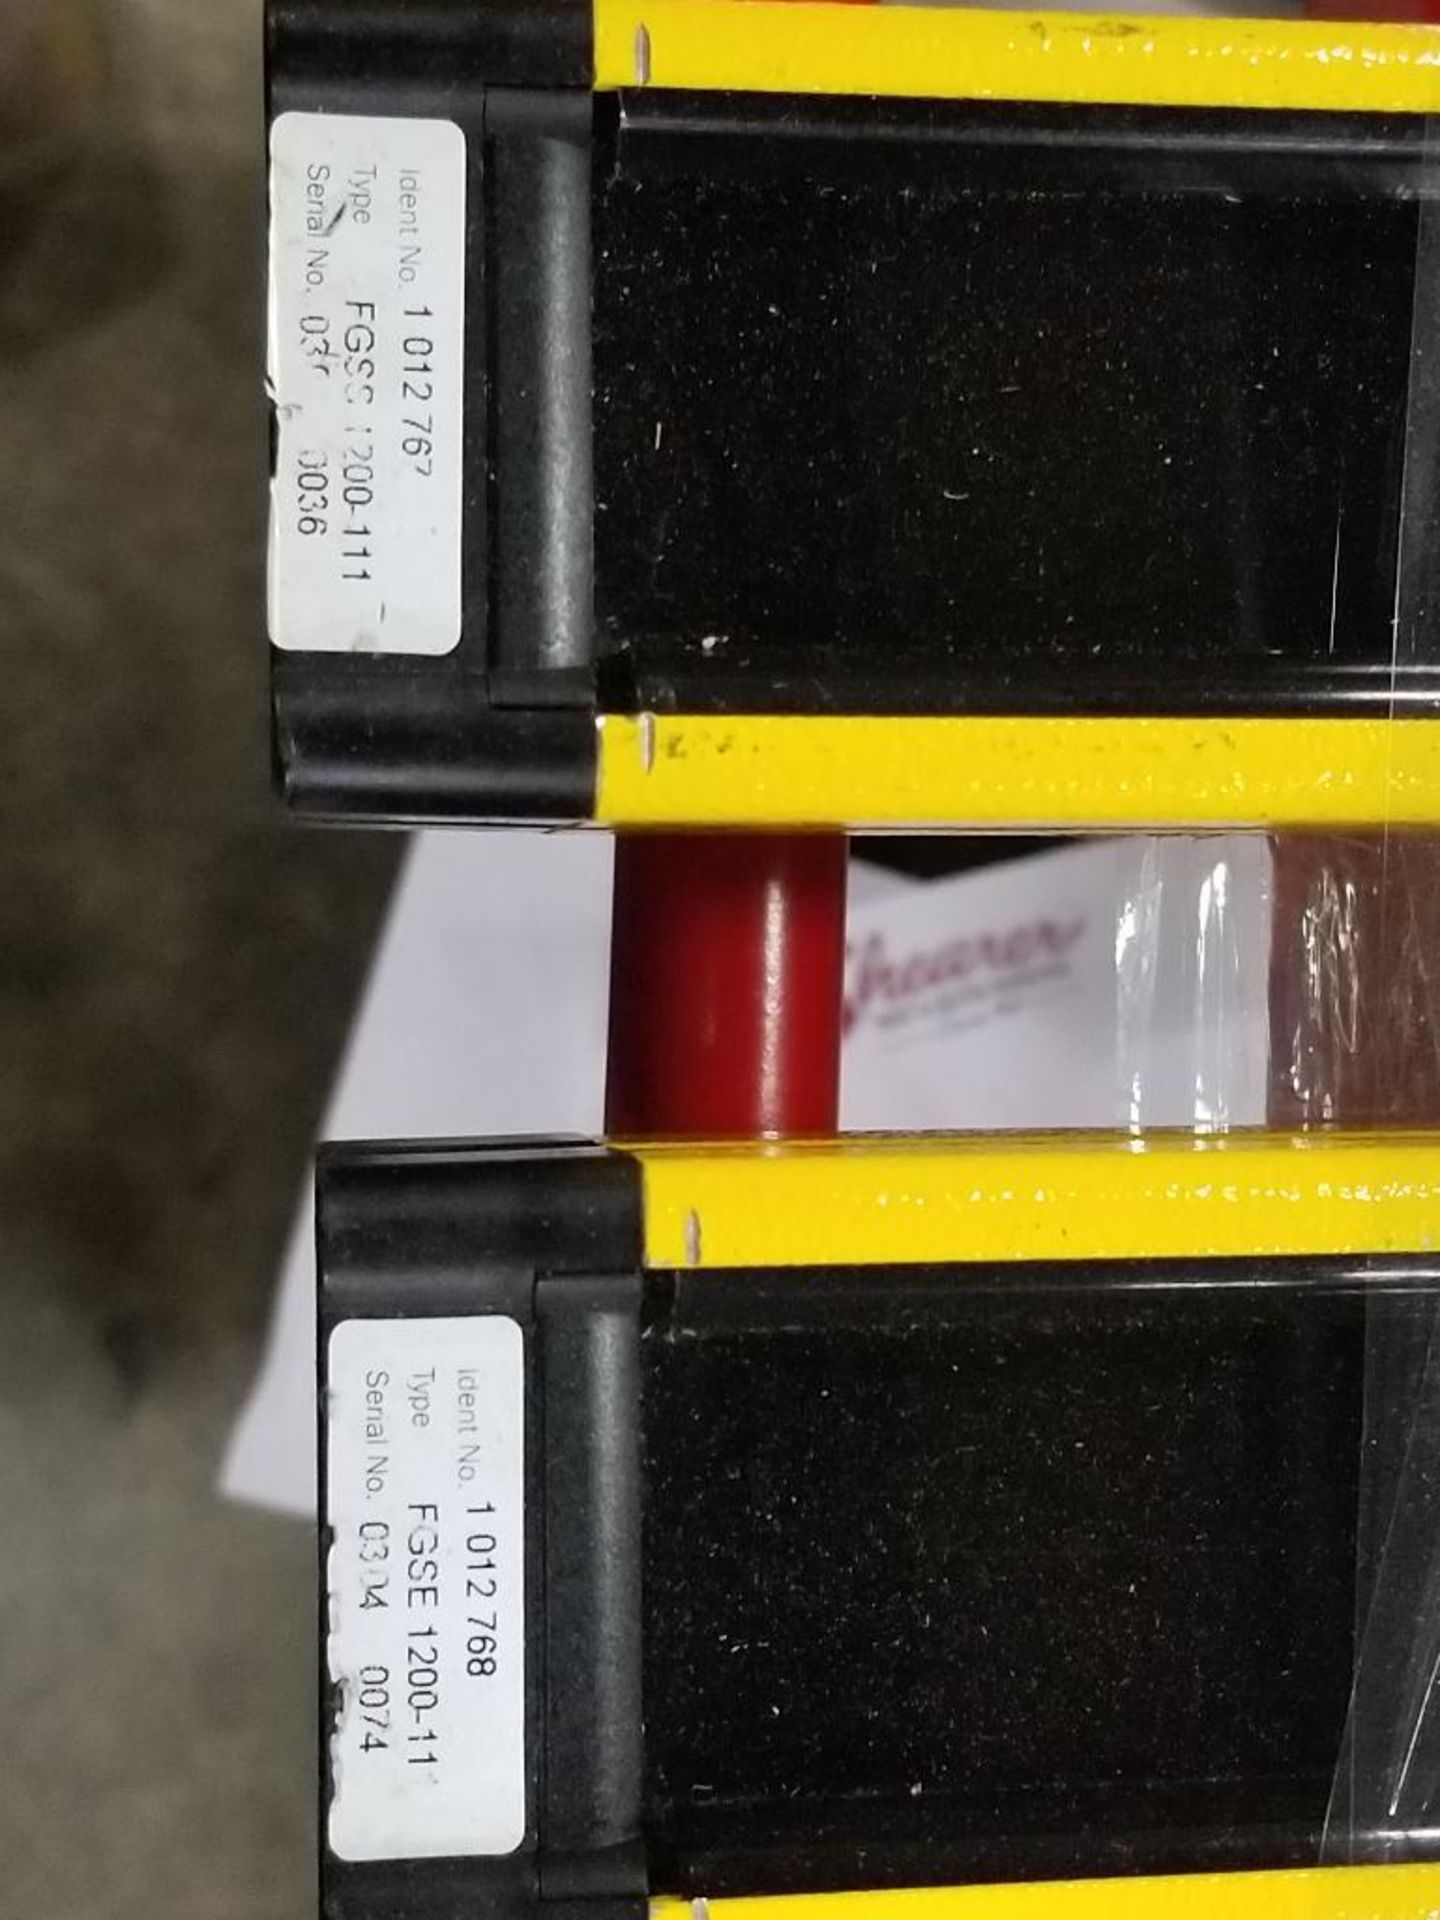 SICK Light curtain transmitter / receiver set. 14-FGS 1-012-767, 1-012-768. - Image 3 of 10